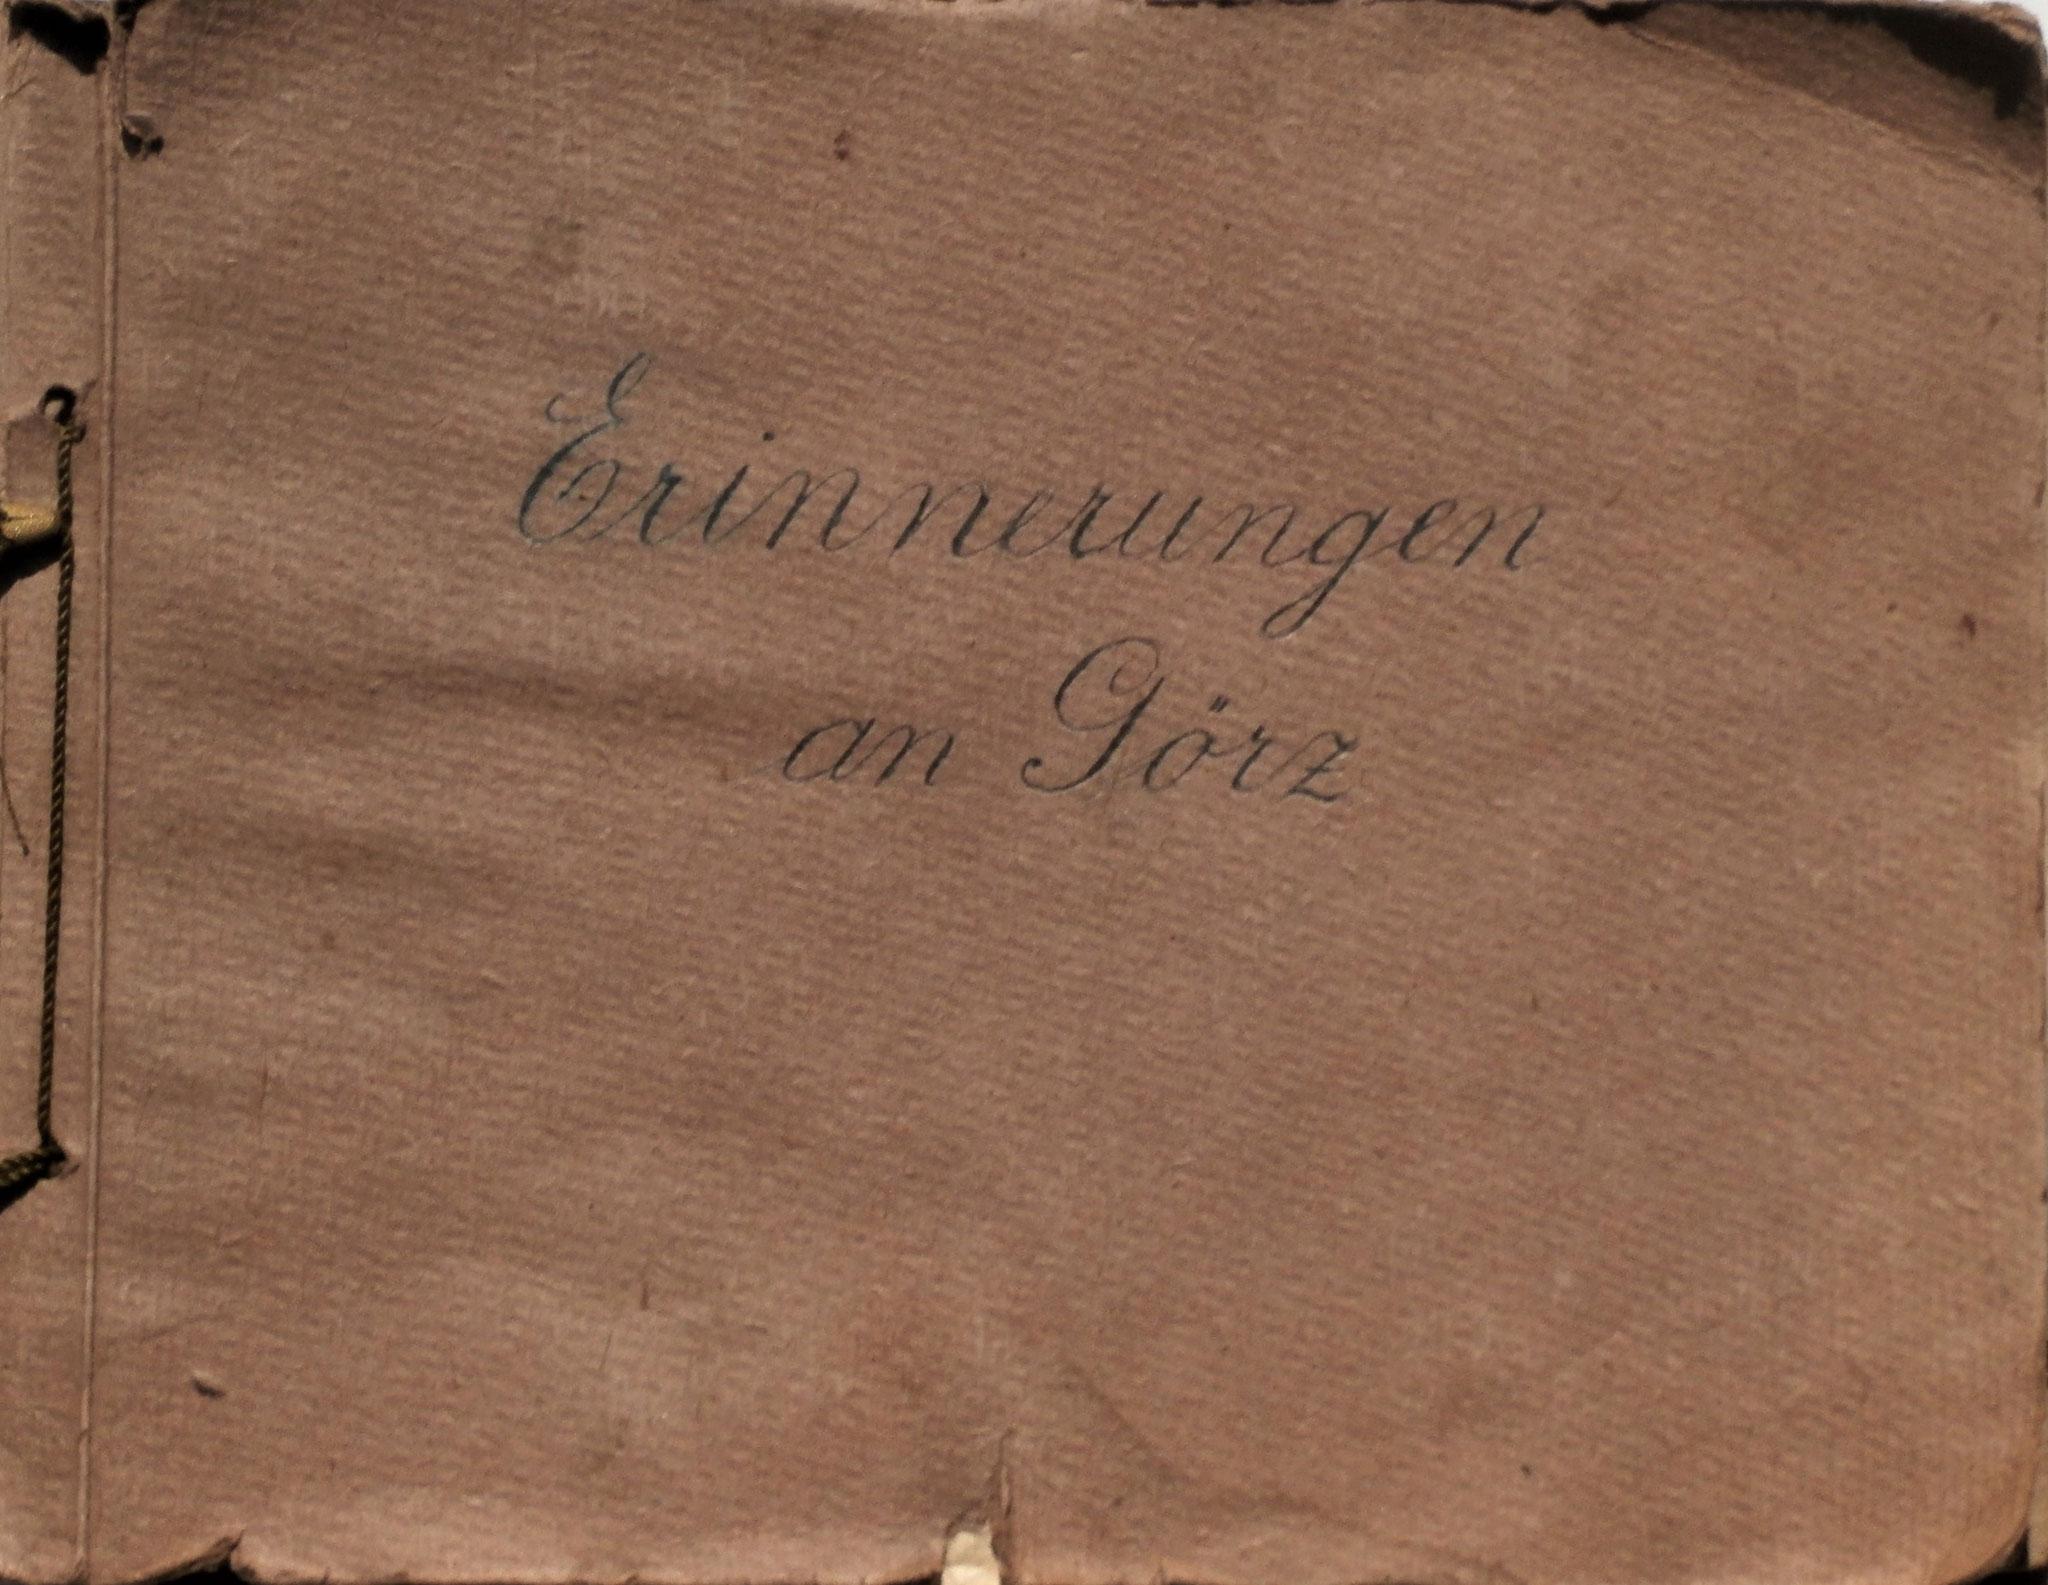 Album Erinnerungen an Görz